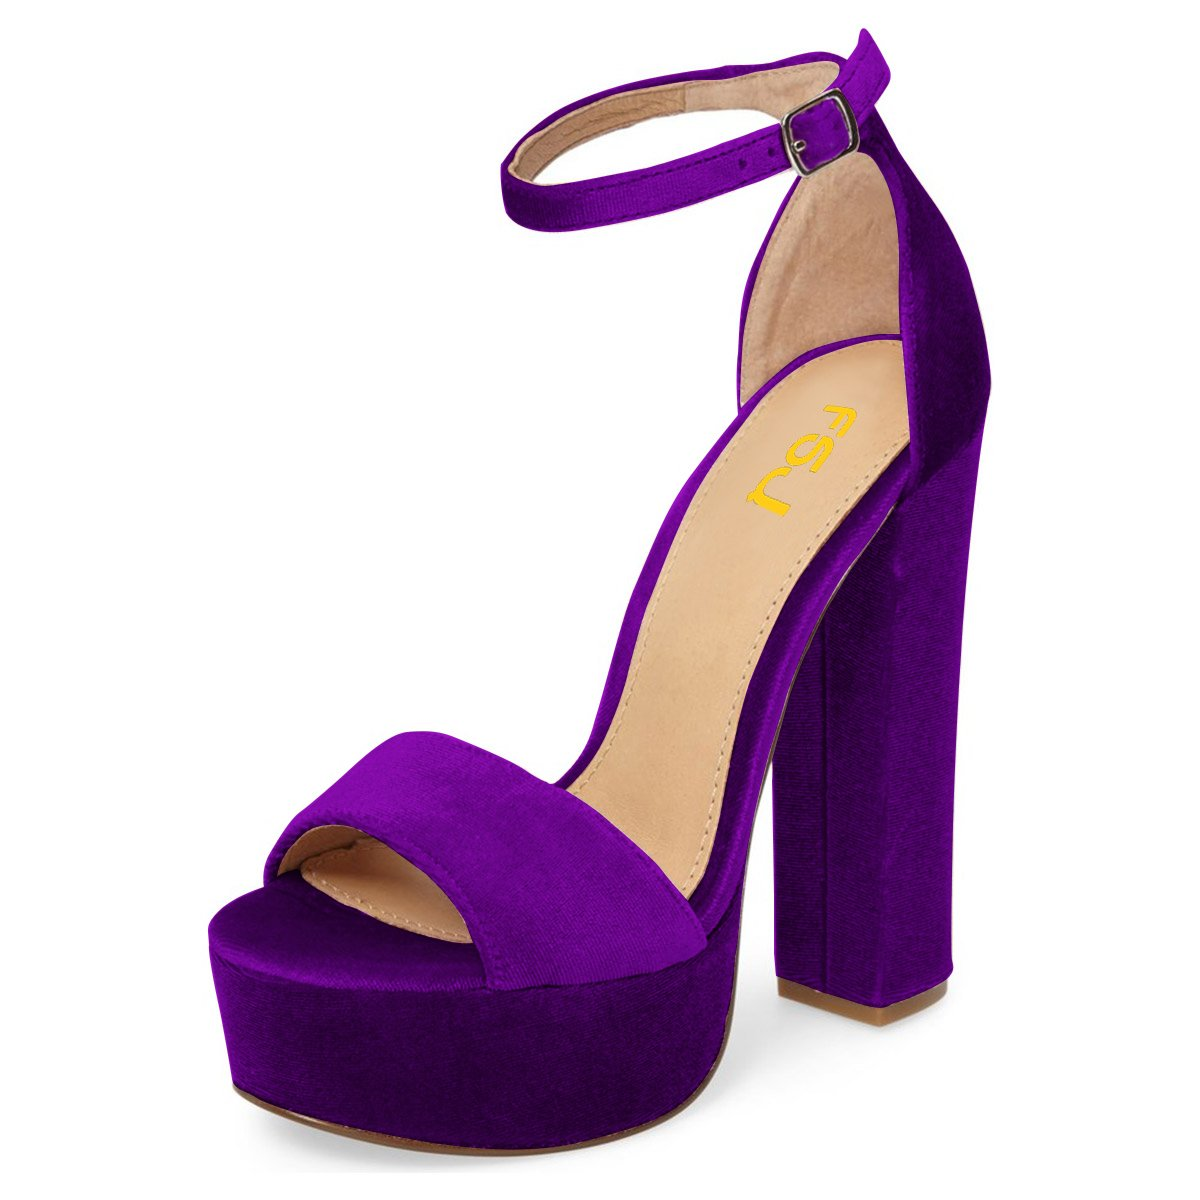 FSJ Women Sexy Ankle Strap Platform Sandals Chunky High Heel Open Toe Velvet Shoes Size 4-15 US B0796Q5JRW 12 B(M) US|Purple